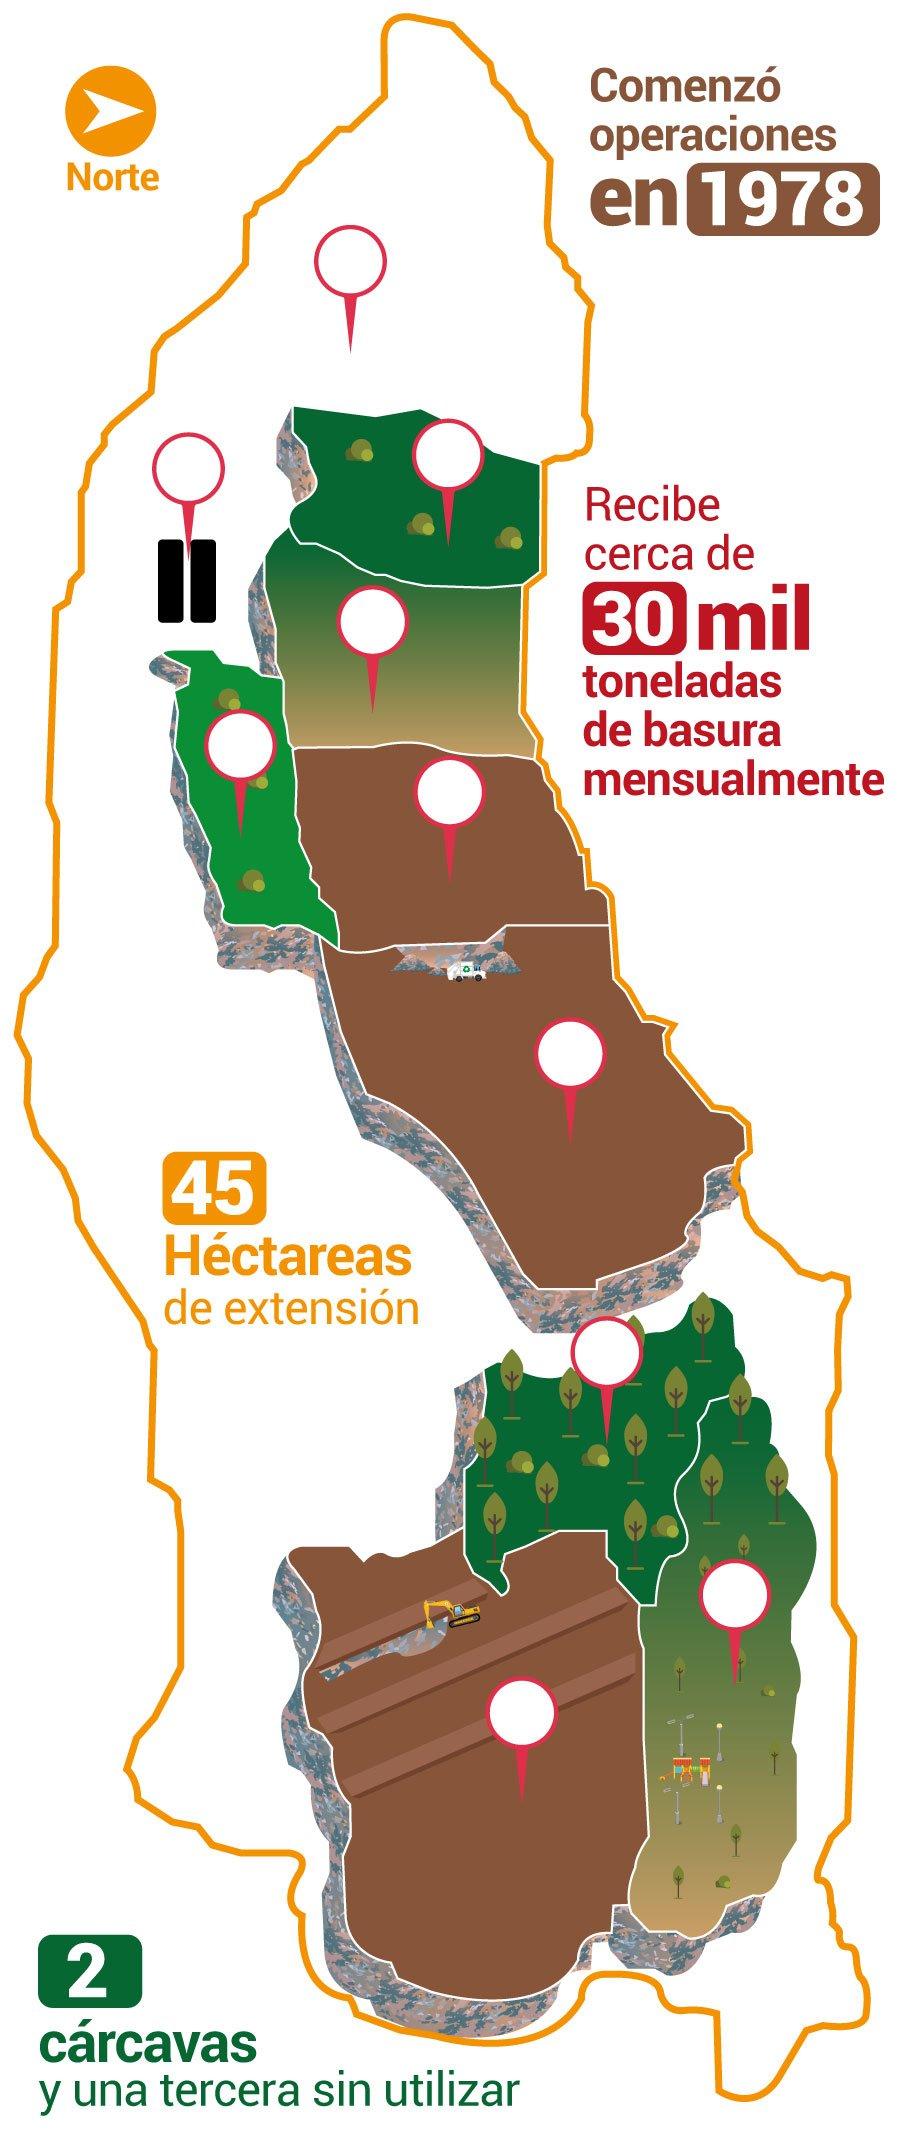 el caso de Vitalogic, El Carrasco, Bucaramanga